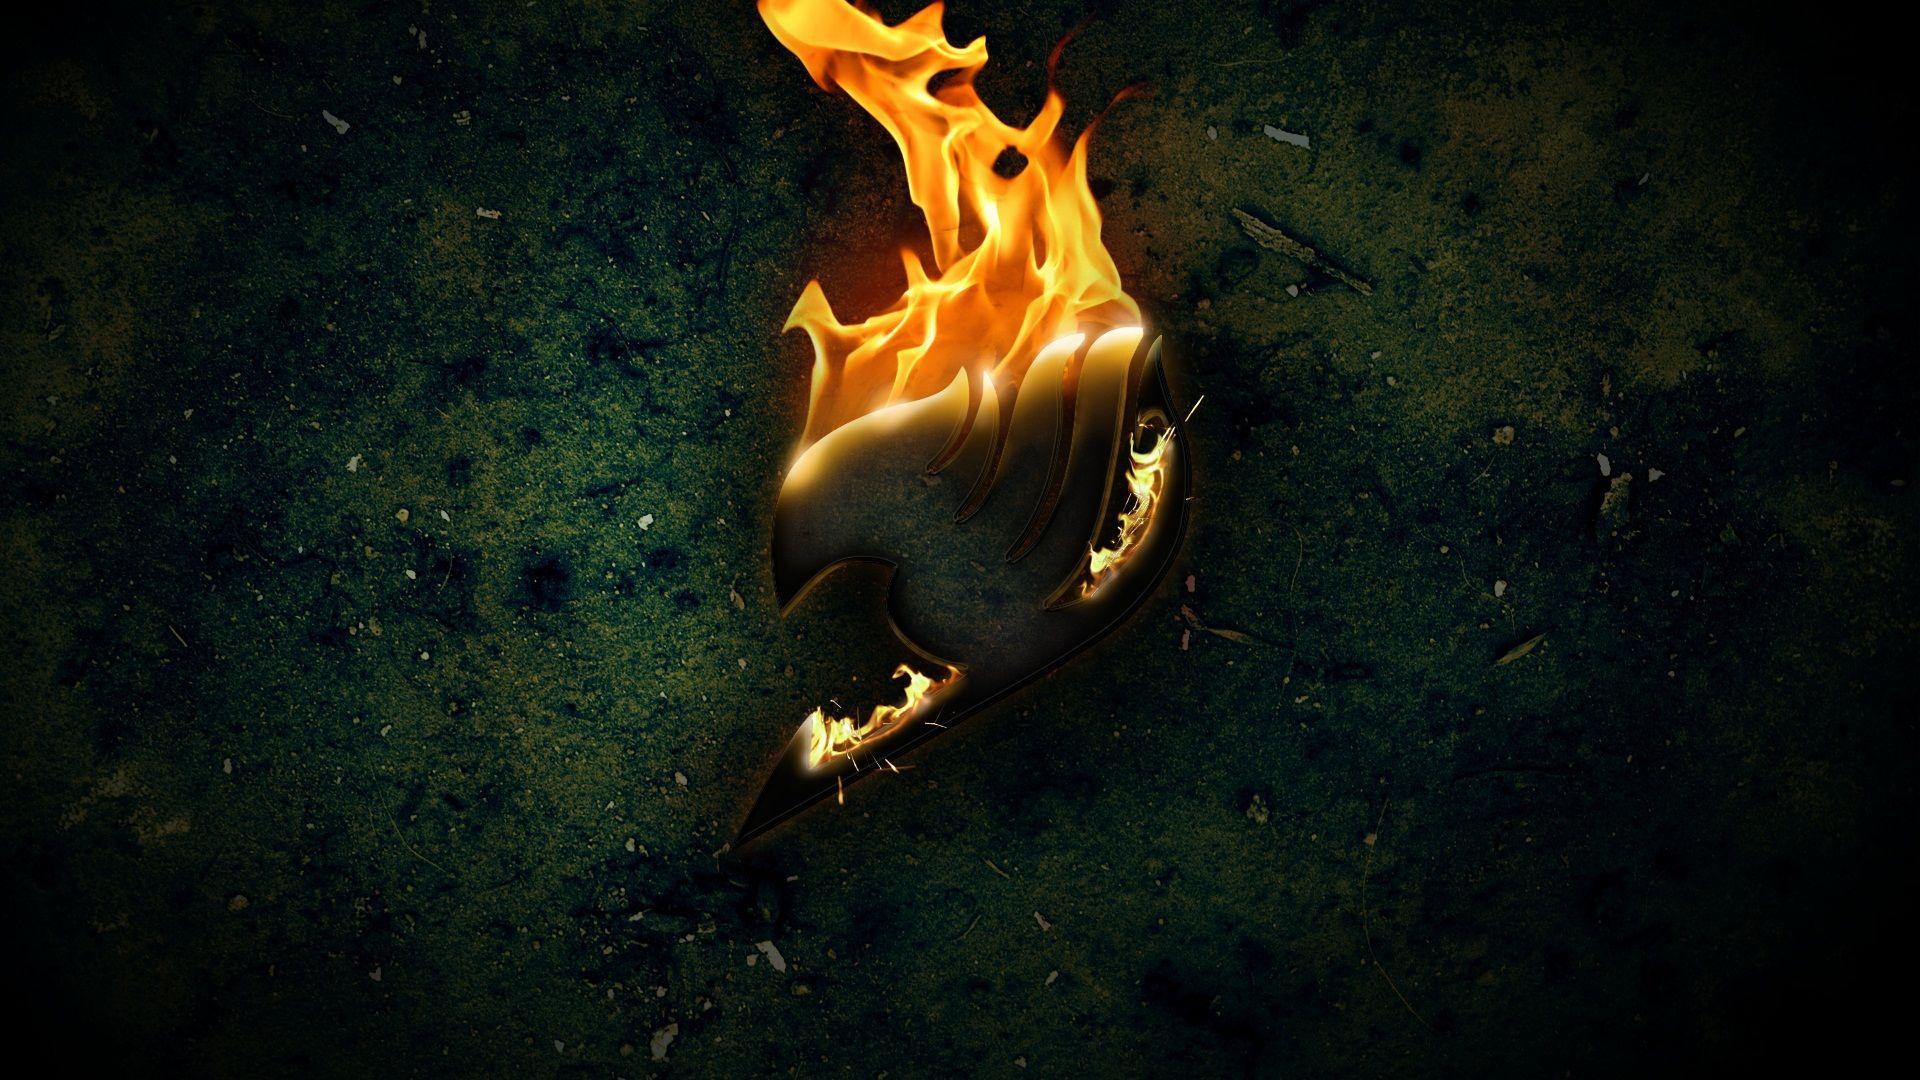 Fairy Tail Logo on Fire Wallpaper Fairy Tail Pinterest